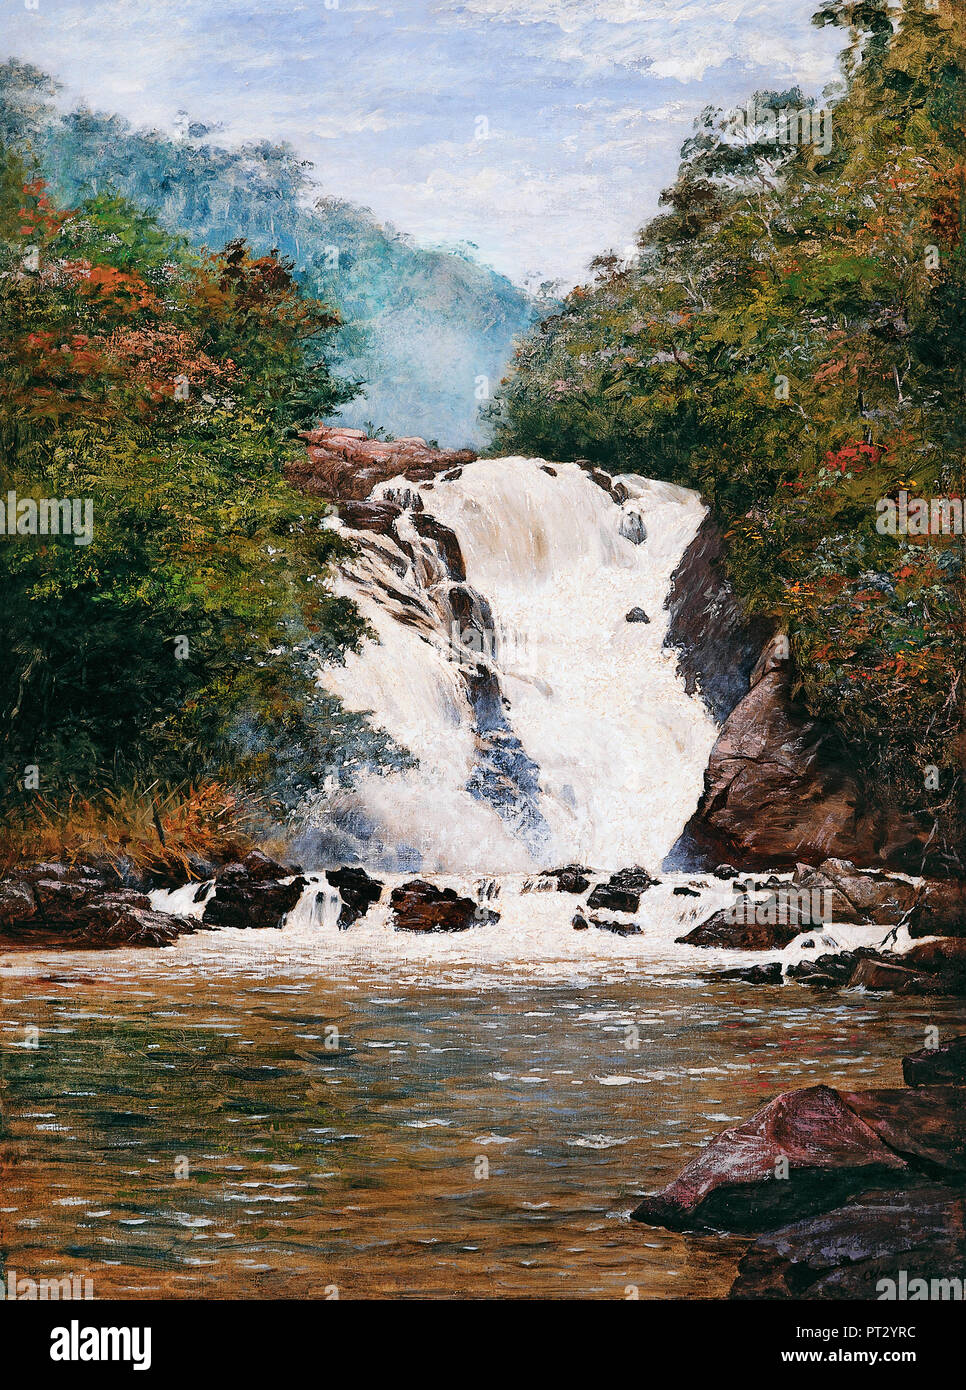 Jose Ferraz de Almeida Junior, Votorantim Wasserfall 1893 Öl auf Leinwand, Pinacoteca do Estado de Sao Paulo, Sao Paulo, Brasilien. Stockfoto